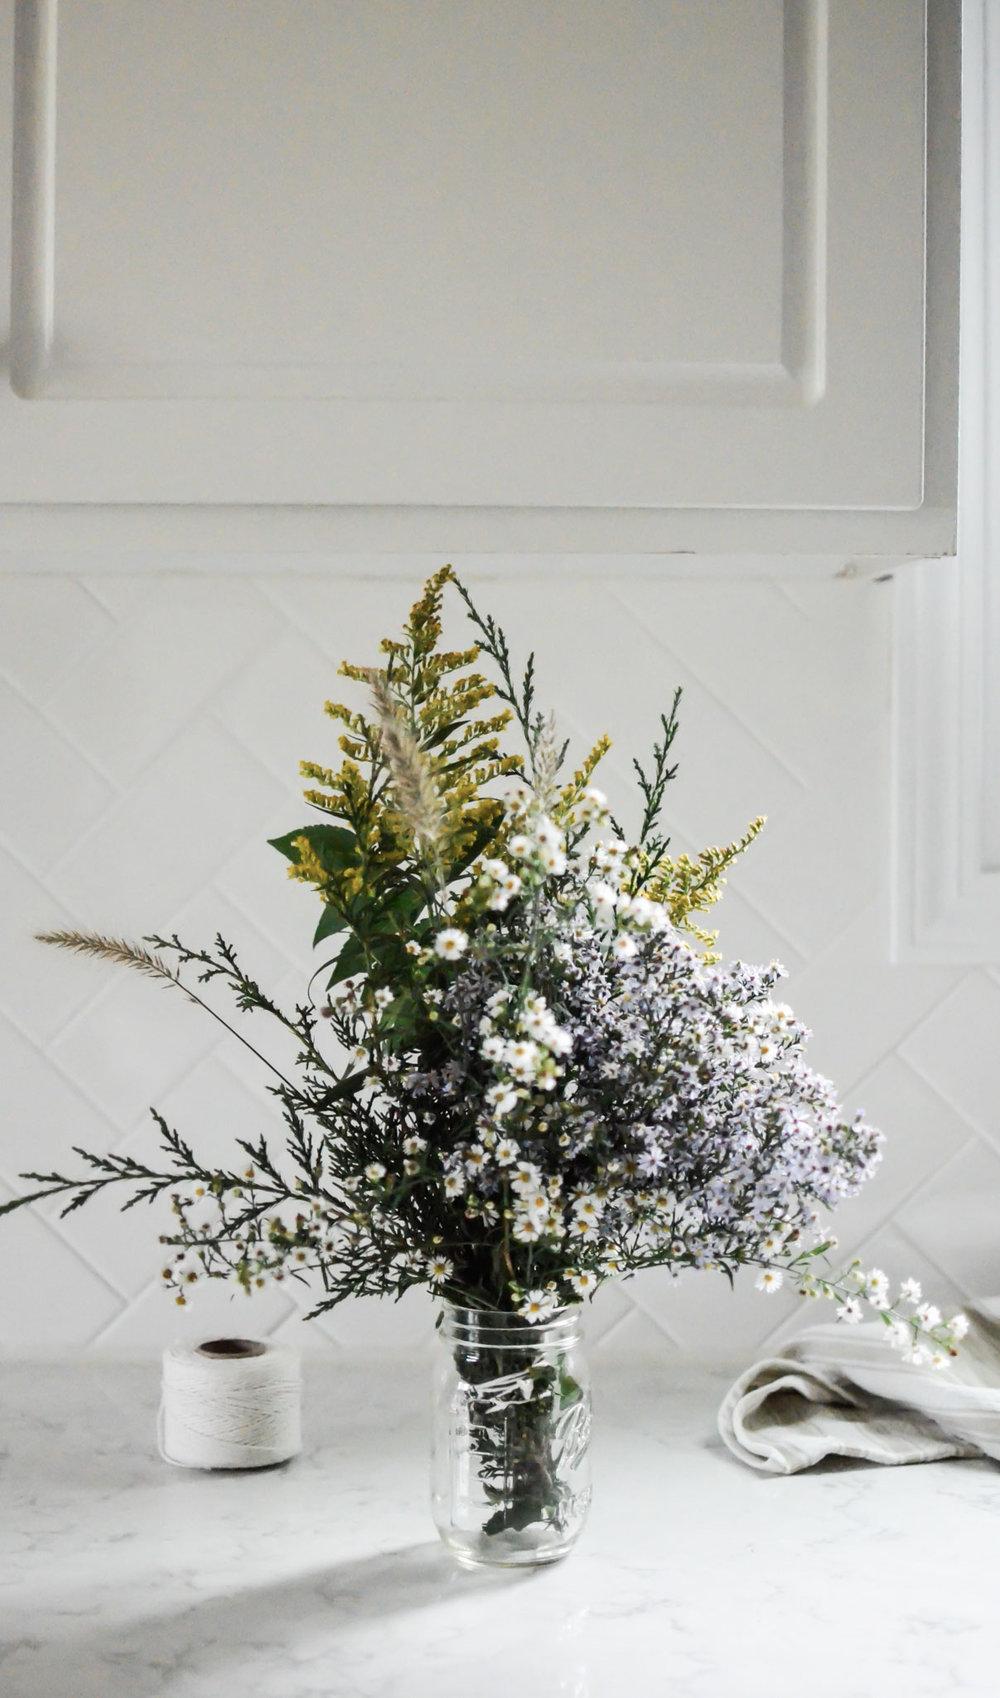 Wendling_Boyd__Wild_Flowers-2.jpg